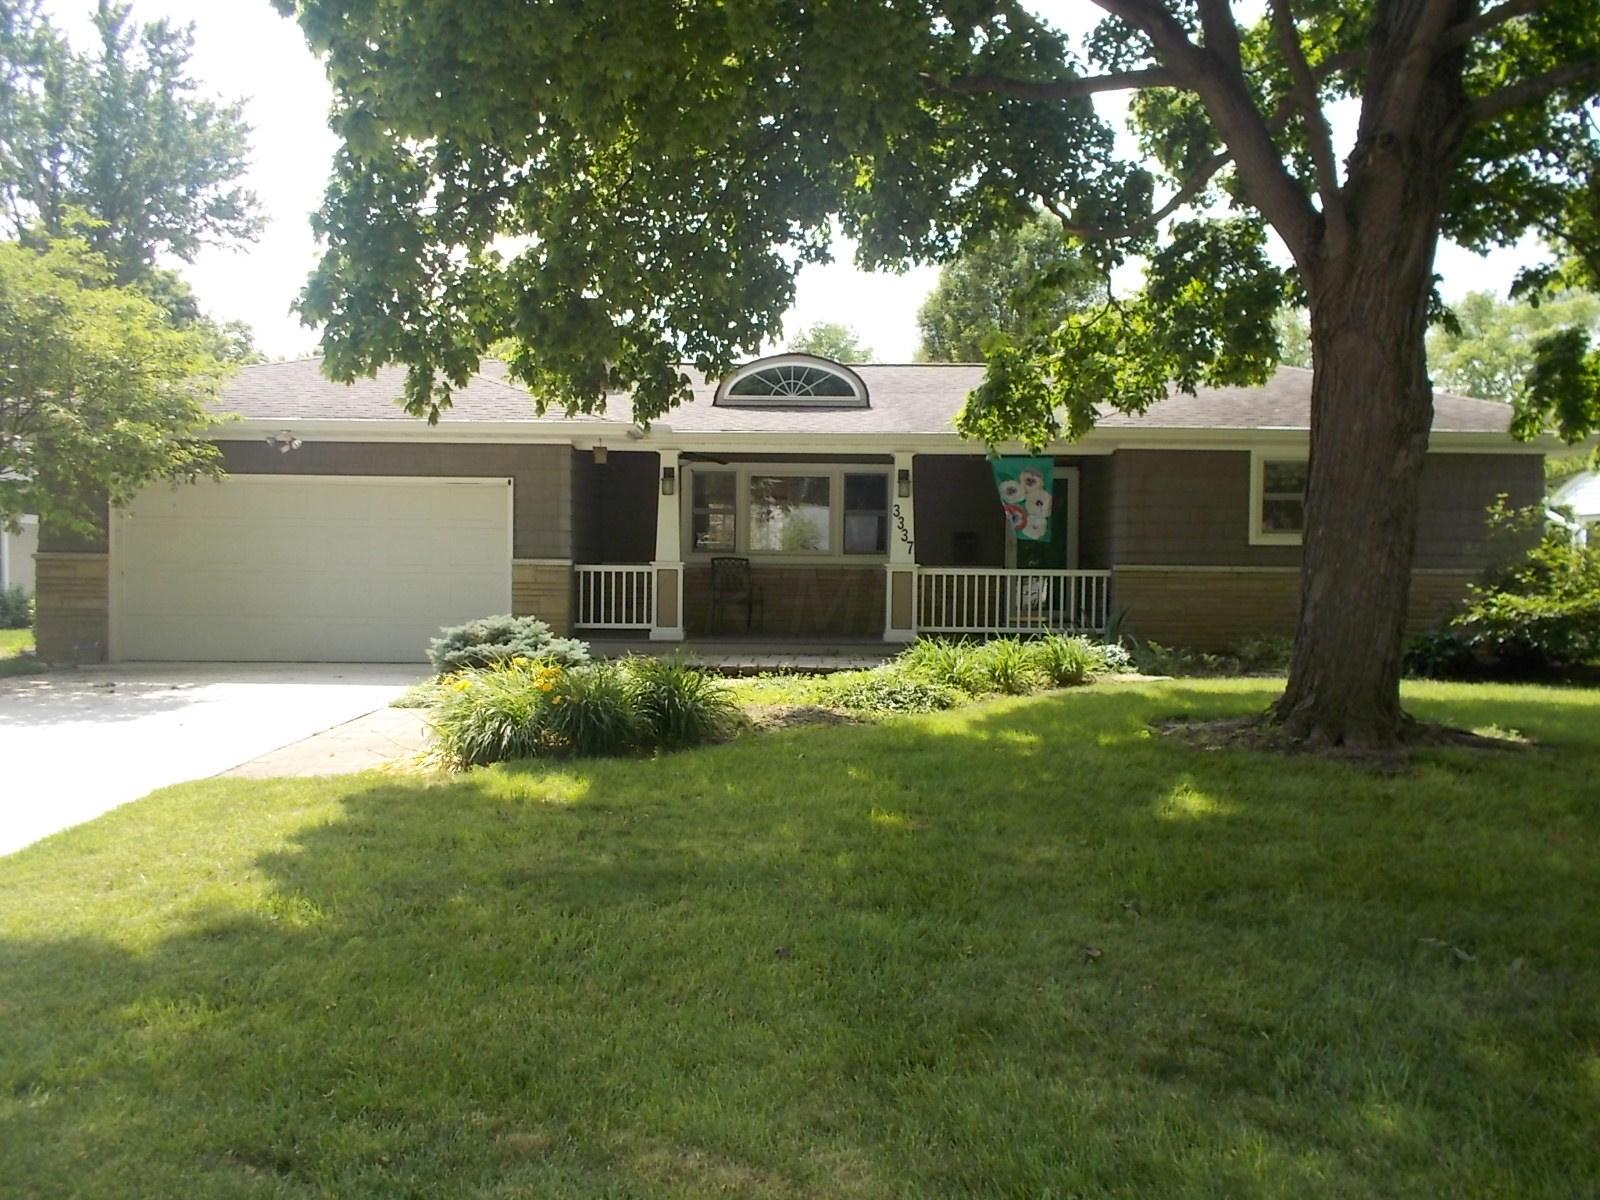 3337 Leighton Road, Columbus, Ohio 43221, 3 Bedrooms Bedrooms, ,2 BathroomsBathrooms,Residential,For Sale,Leighton,220018941